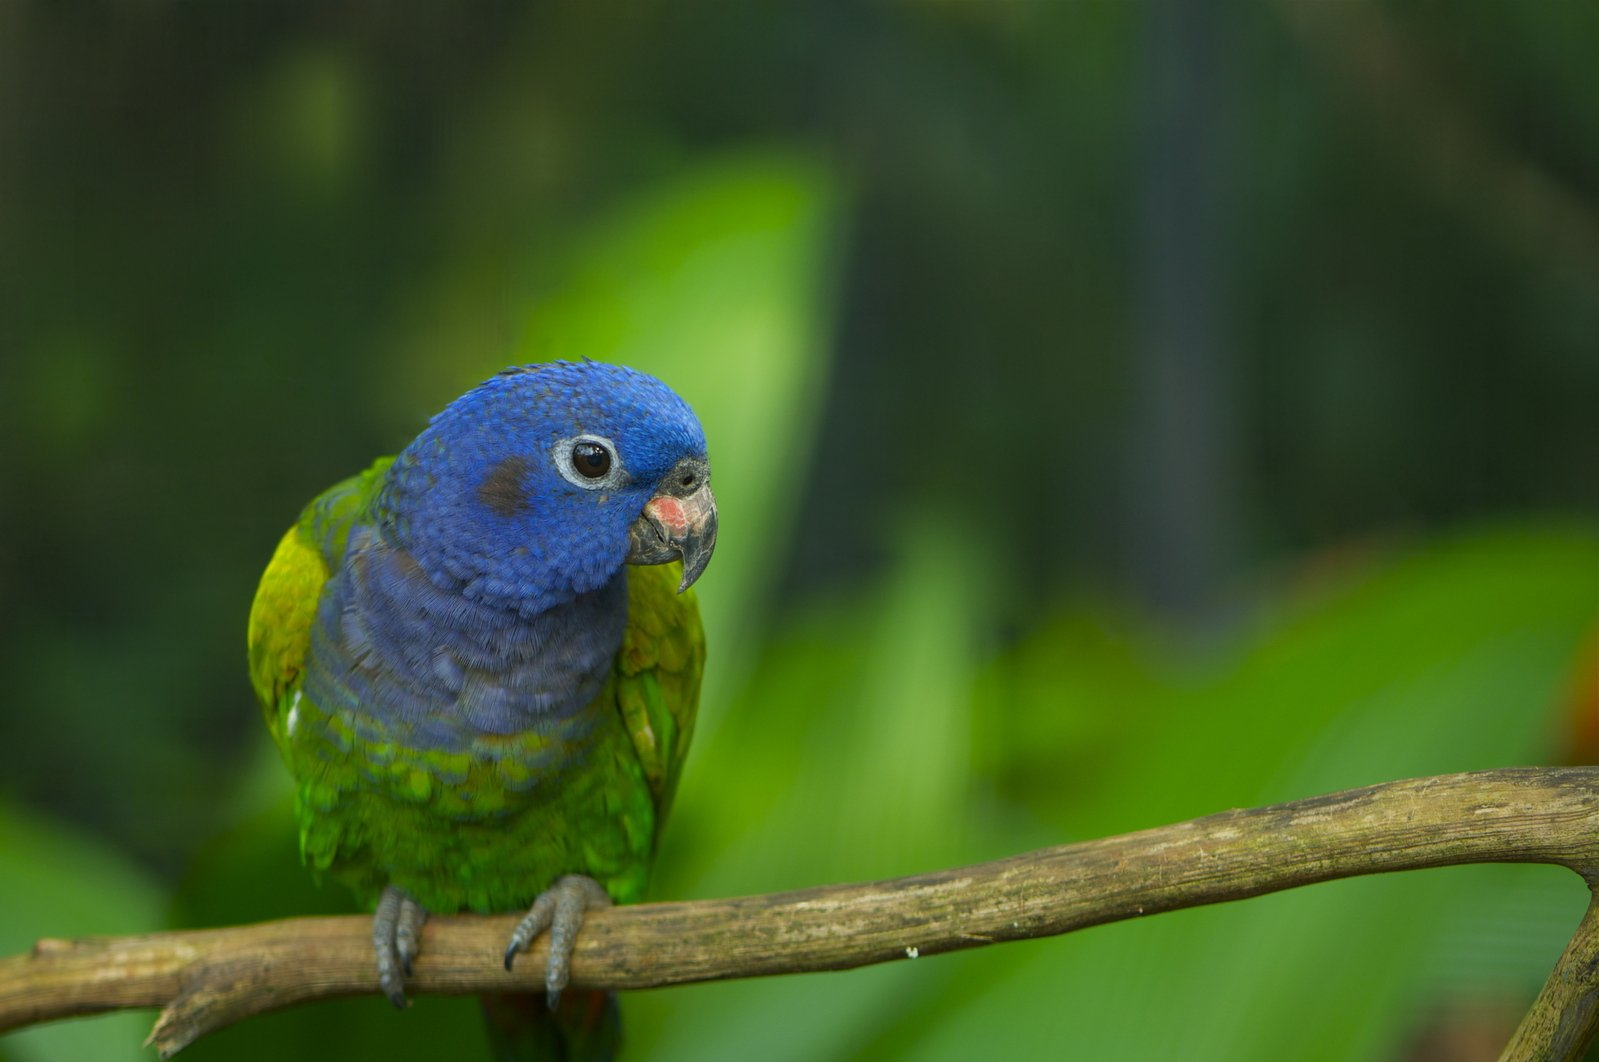 parrots in the rainforest